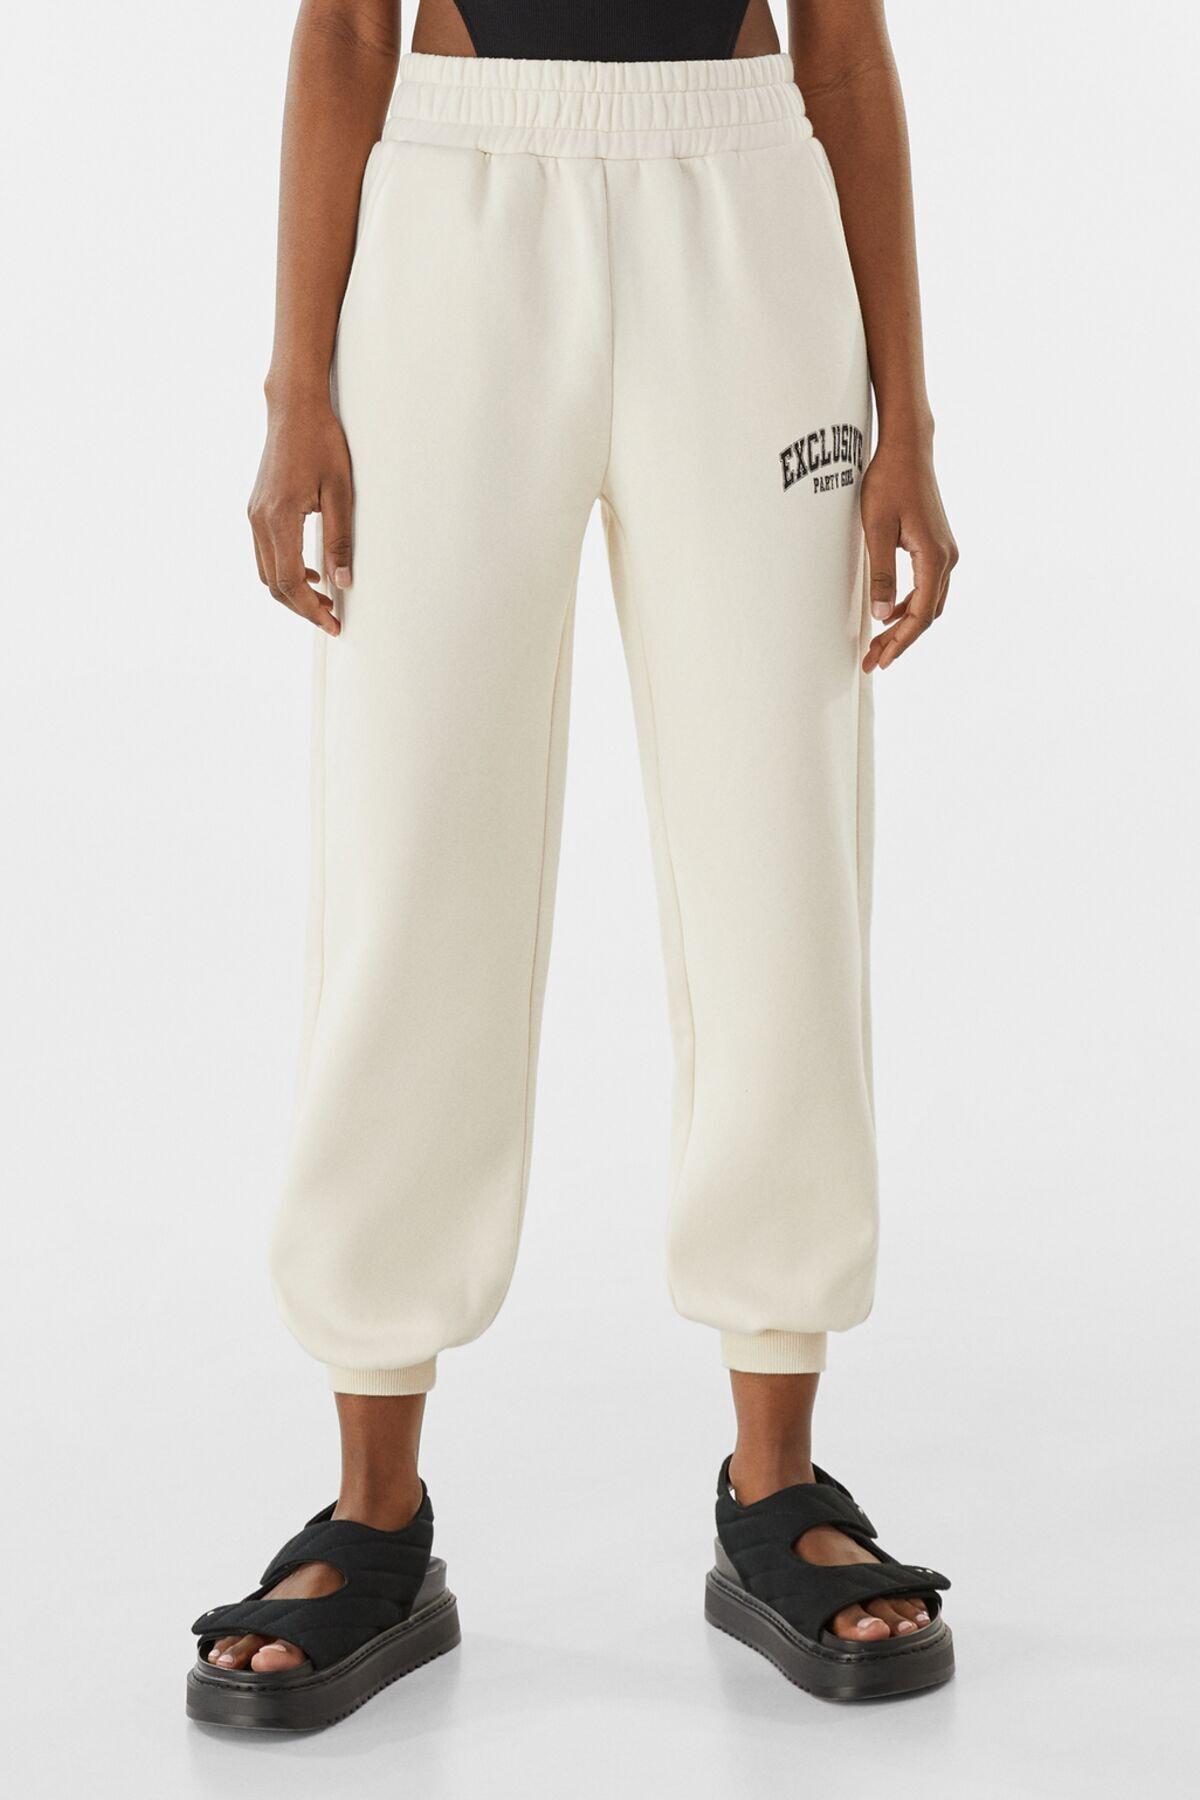 Bershka Kadın Kum Rengi Pamuklu Baskılı Jogging Fit Pantolon 00086539